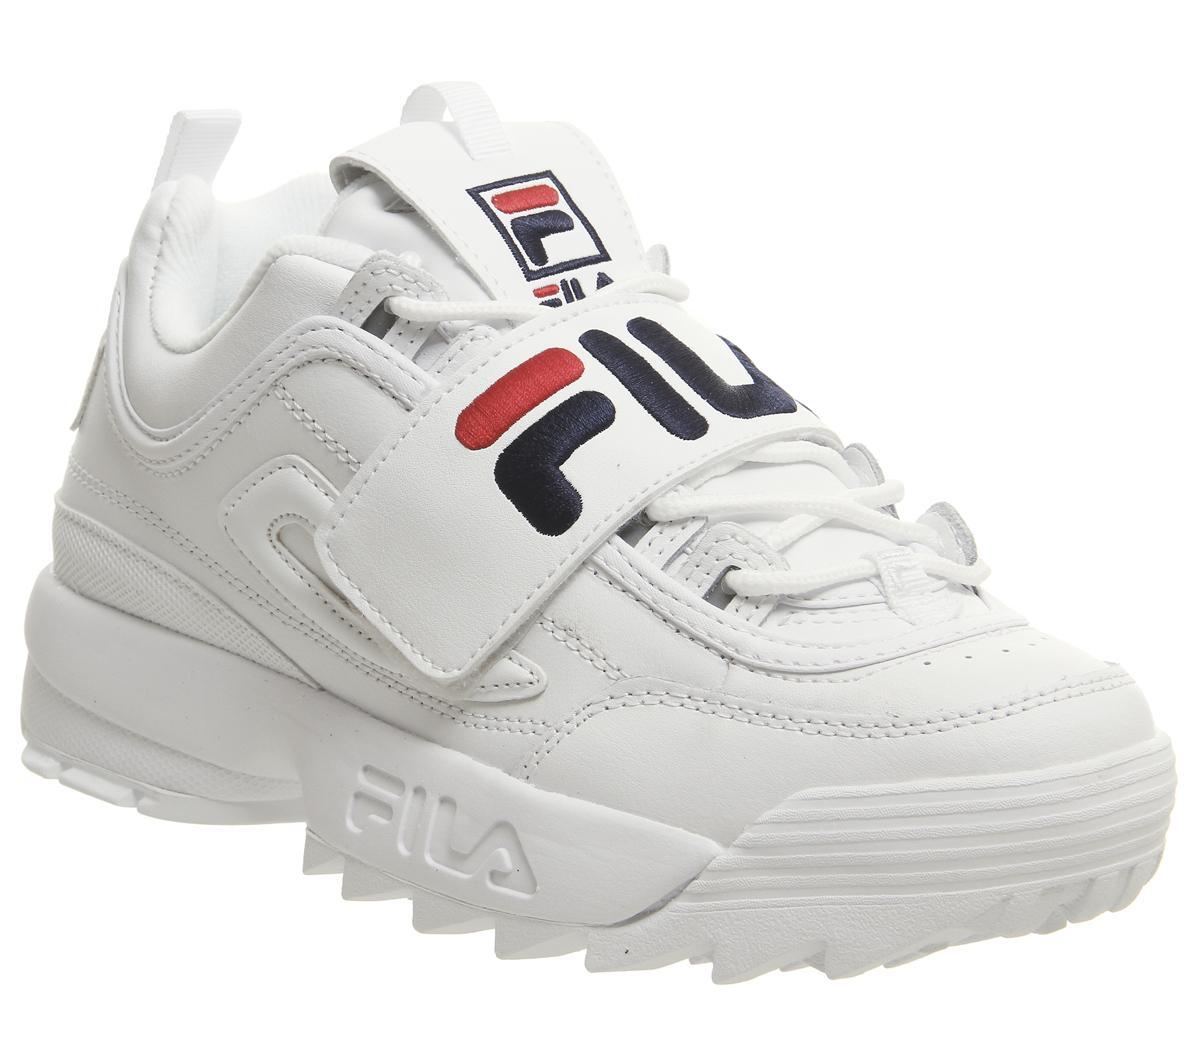 Fila Disruptor II Trainers White Fila